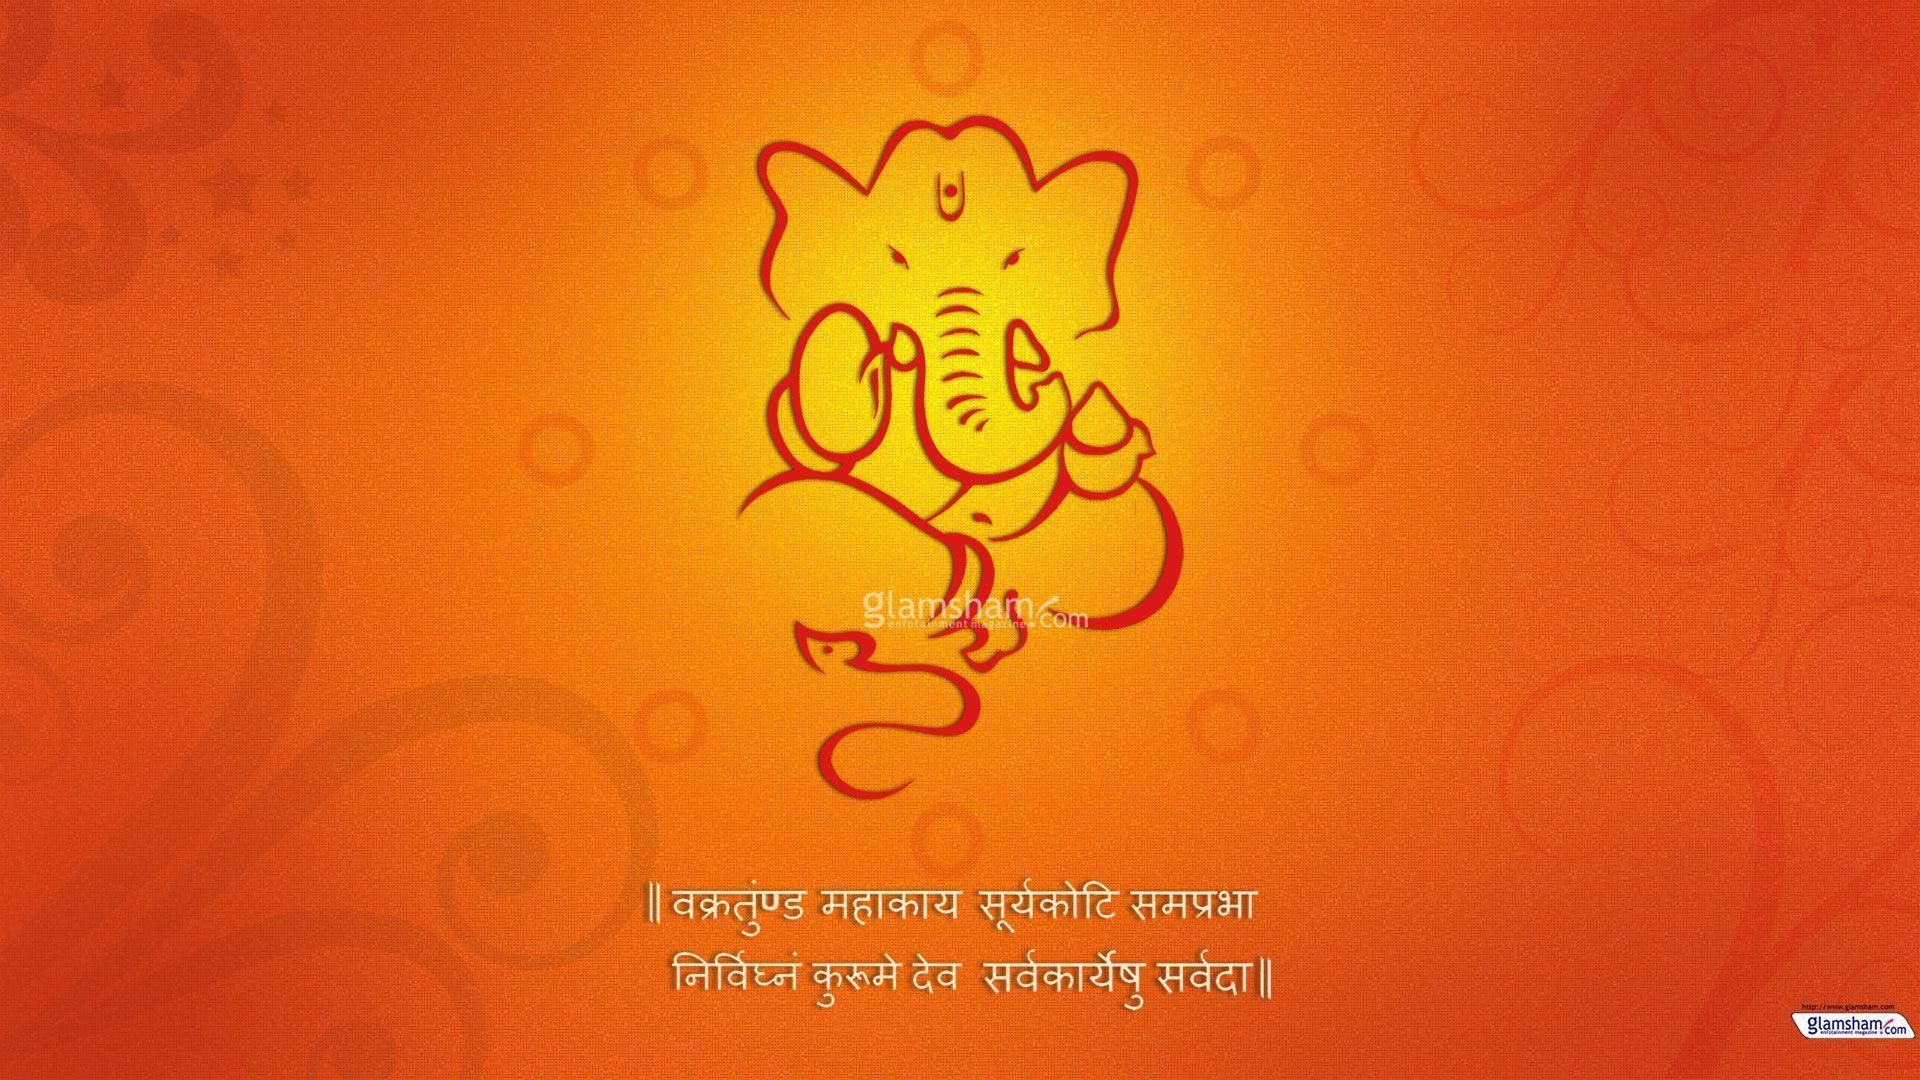 Hd wallpaper ganesh ji - Images For Ganesh Ji Wallpaper Background